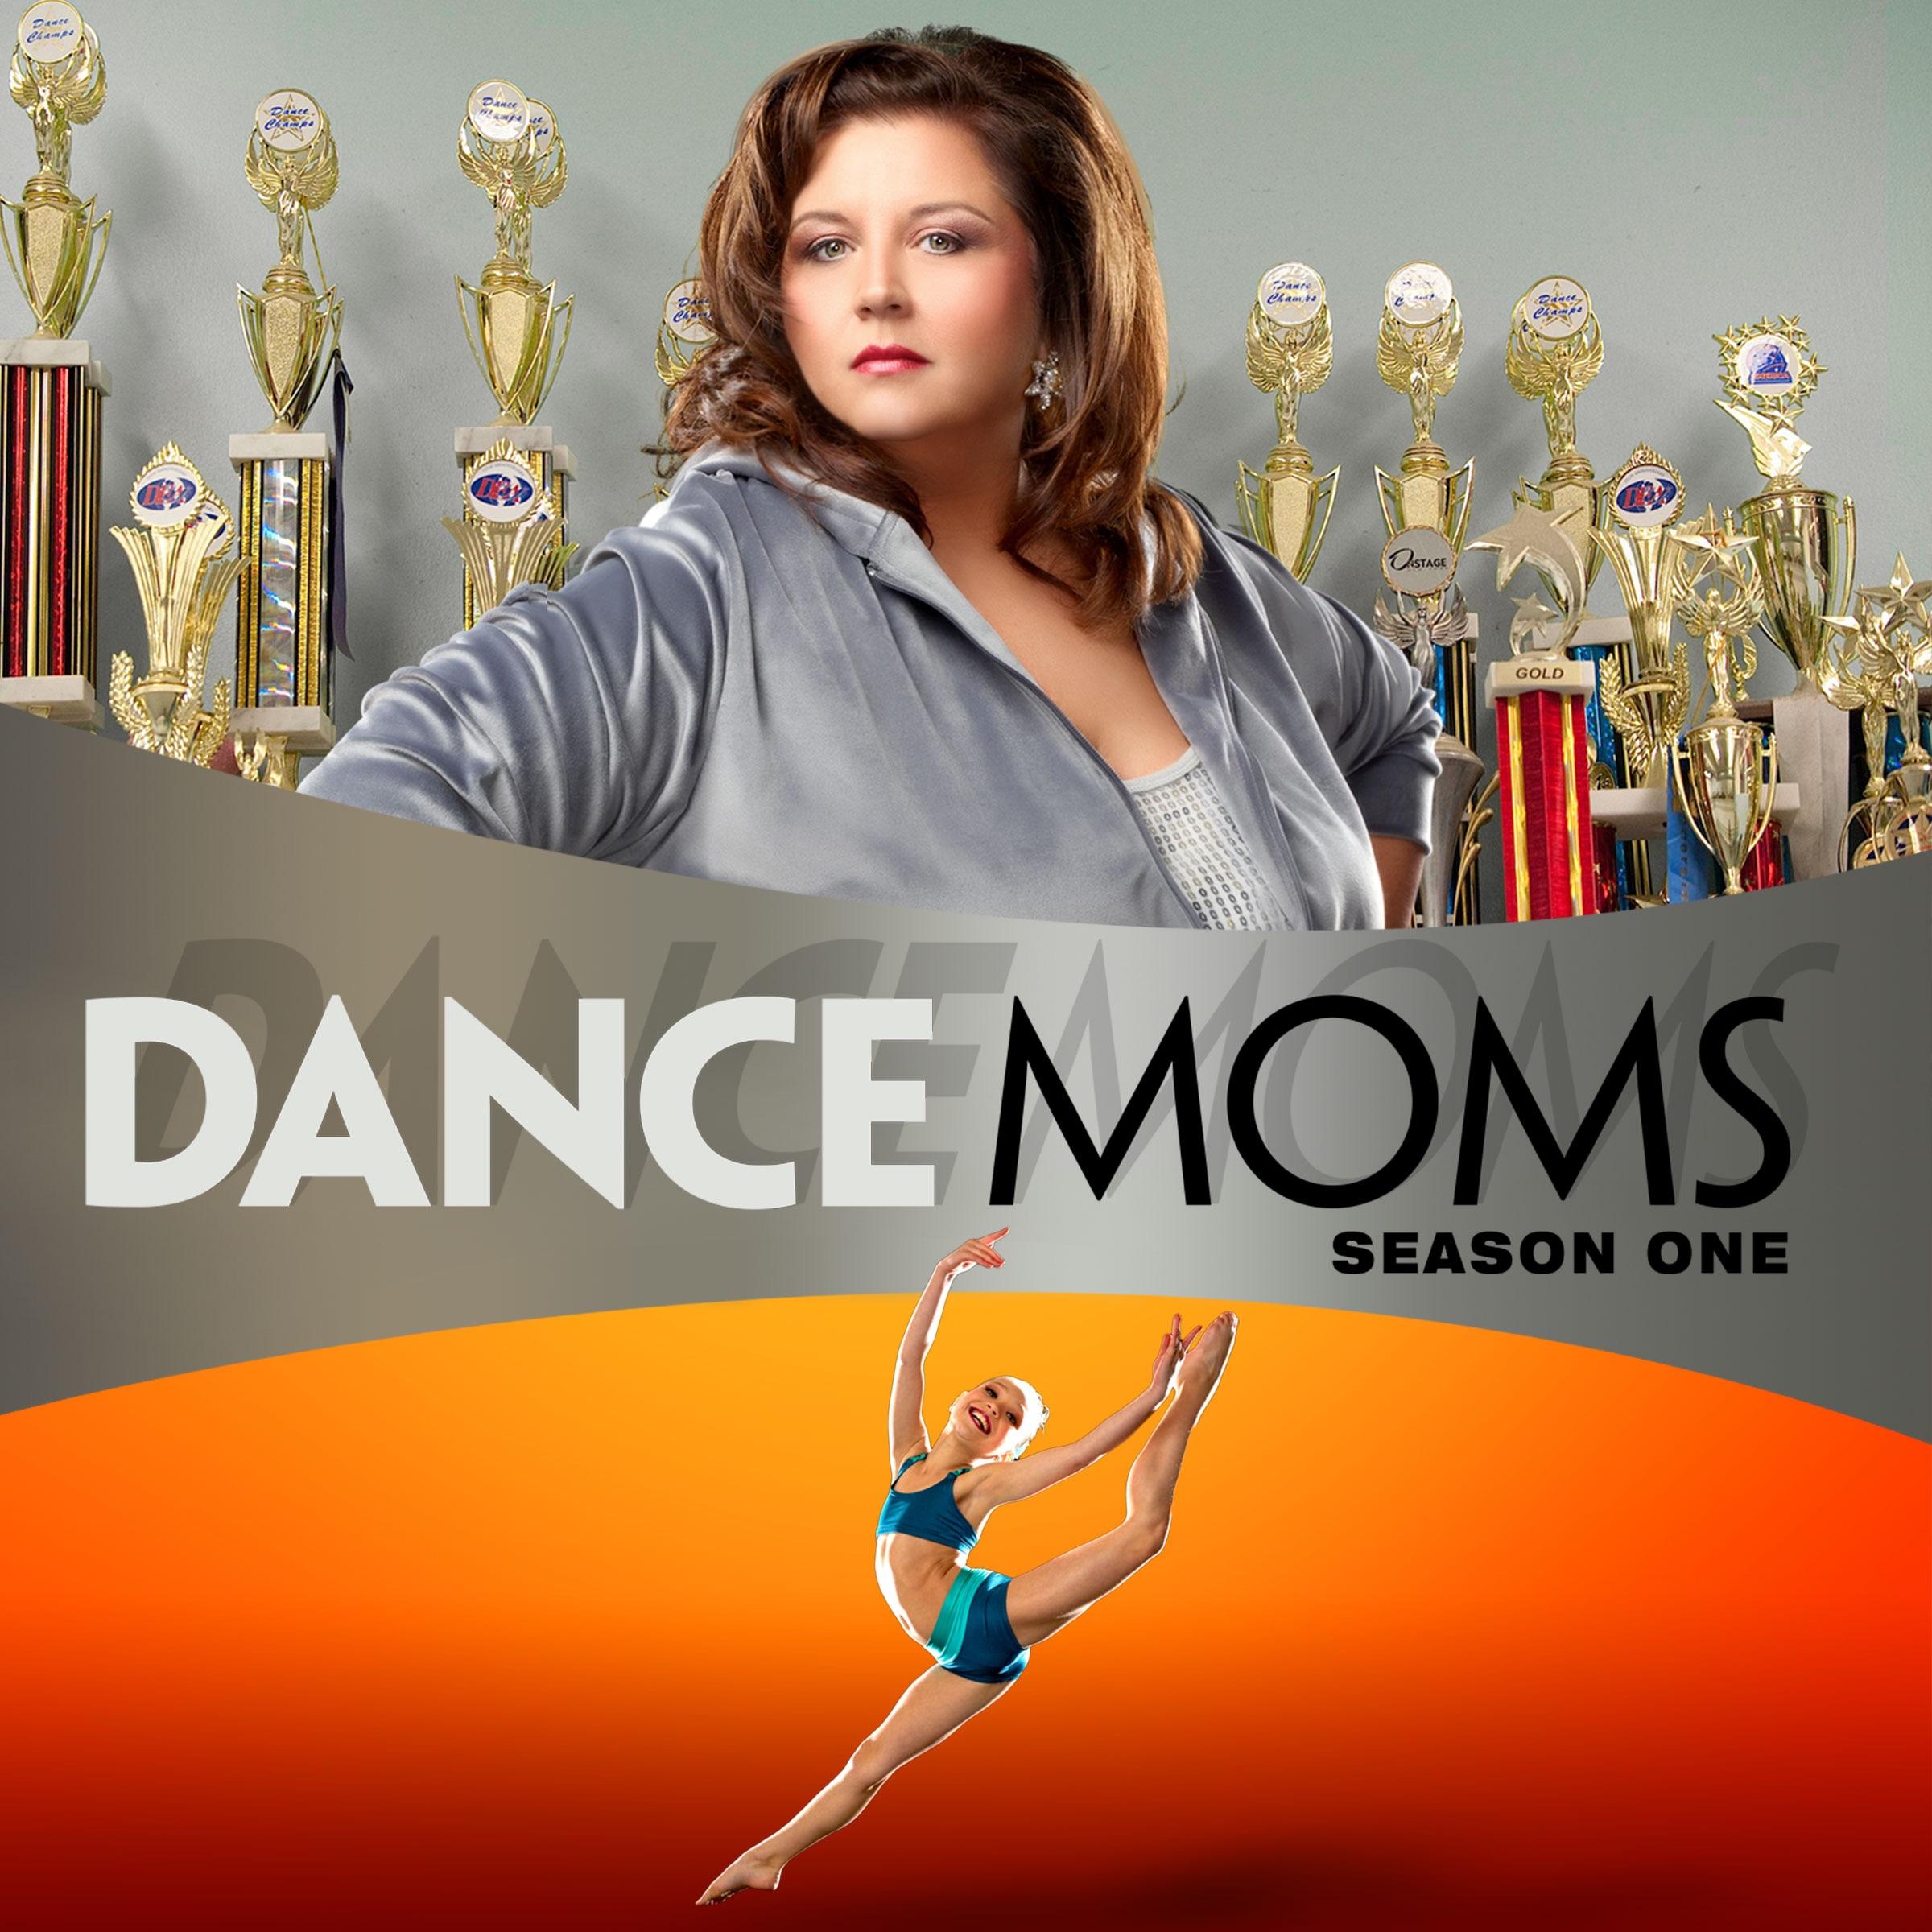 Dance Moms, Season 7 on iTunes |Dance Moms Season 4 Intro